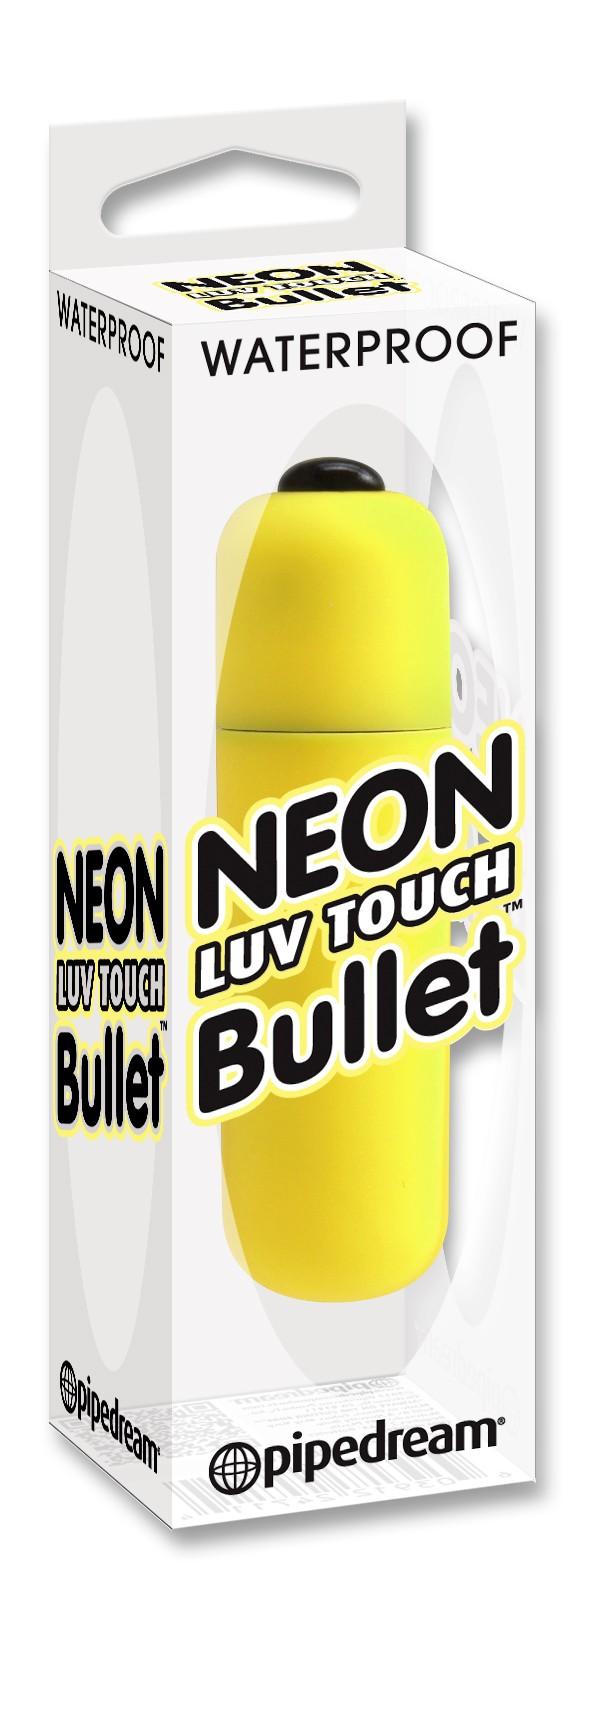 Neon Luv Touch Bullet-MINI-VIBRADOR AMARILLO